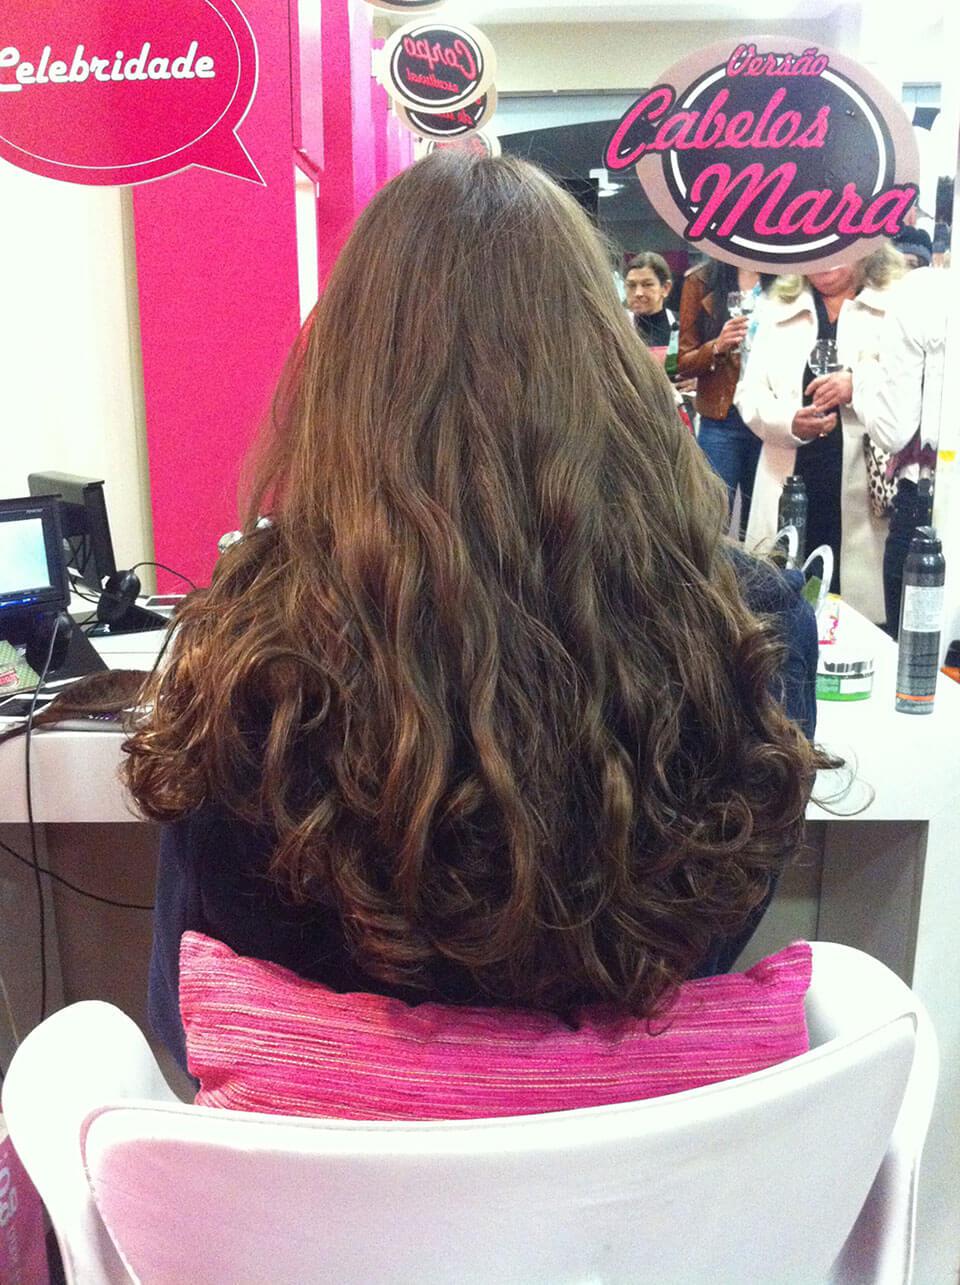 Aplique de cabelos longos da Hairdo